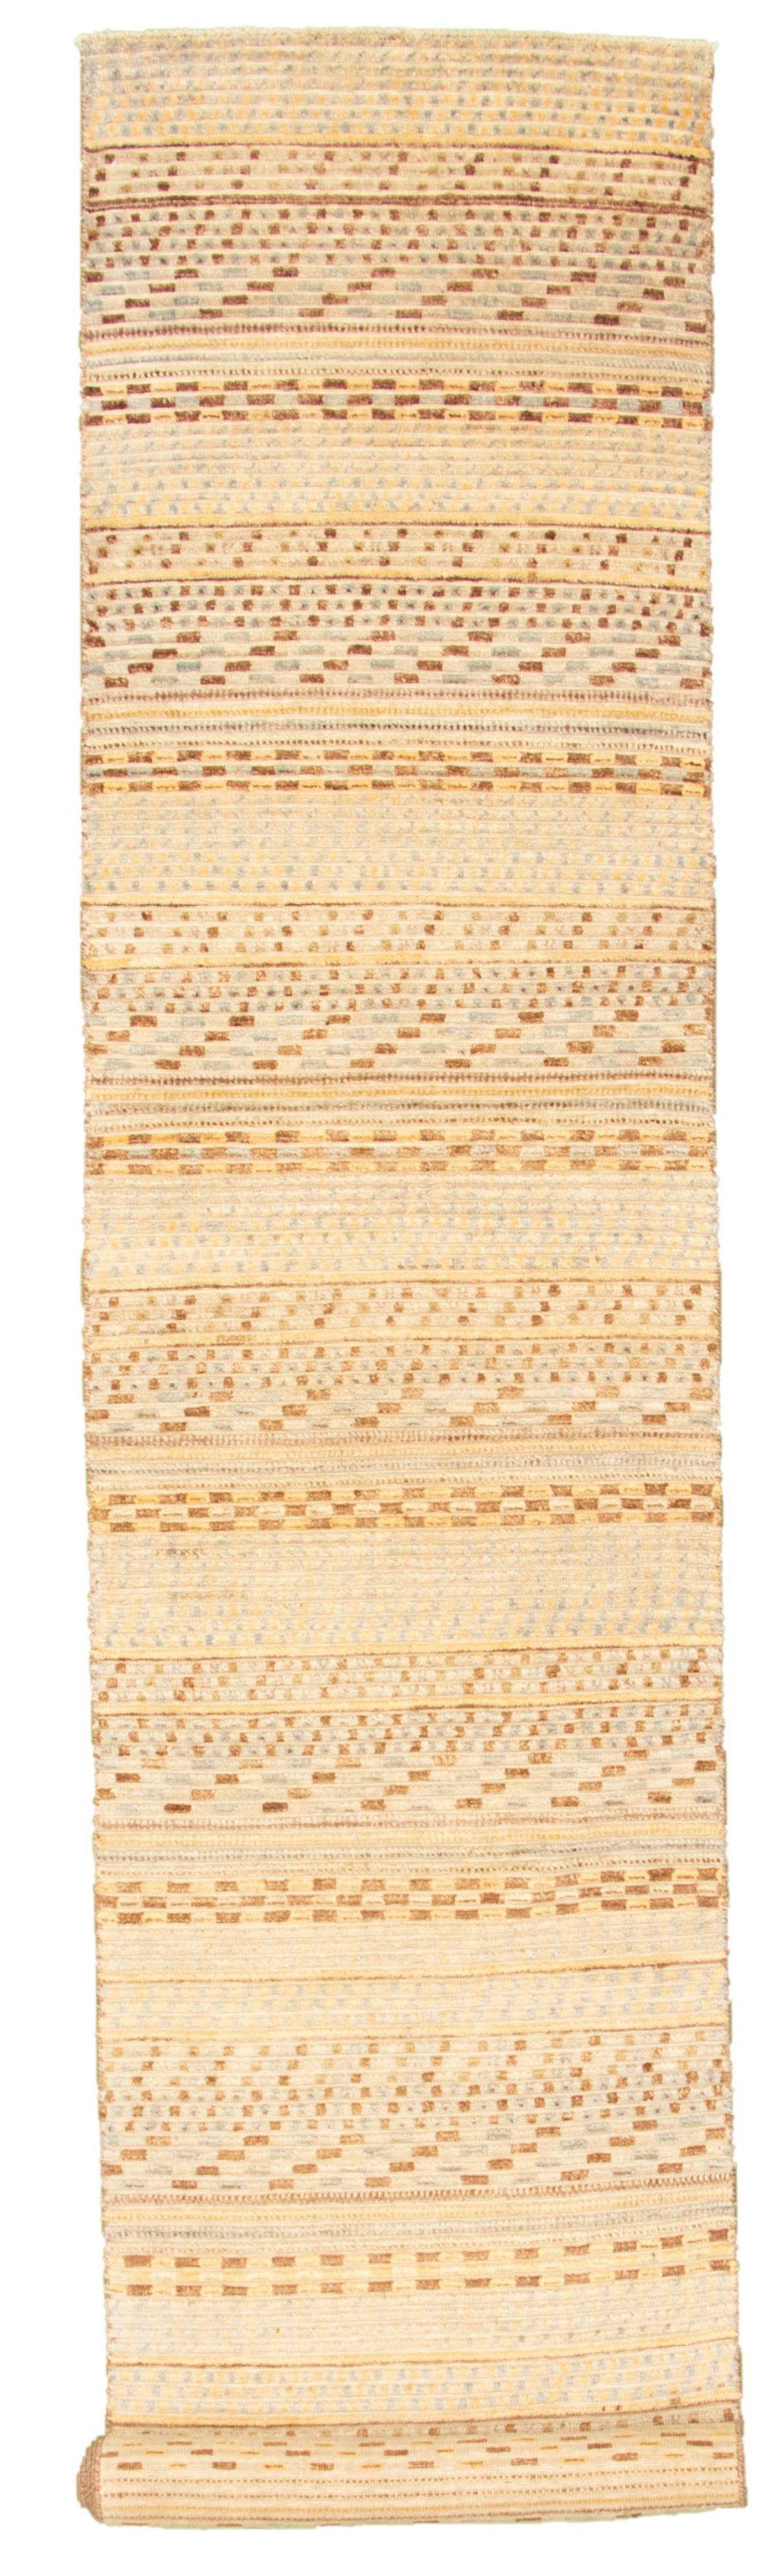 "Hand-knotted Peshawar Ziegler Ivory, Light Blue  Wool Rug 2'7"" x 14'2"" Size: 2'7"" x 14'2"""